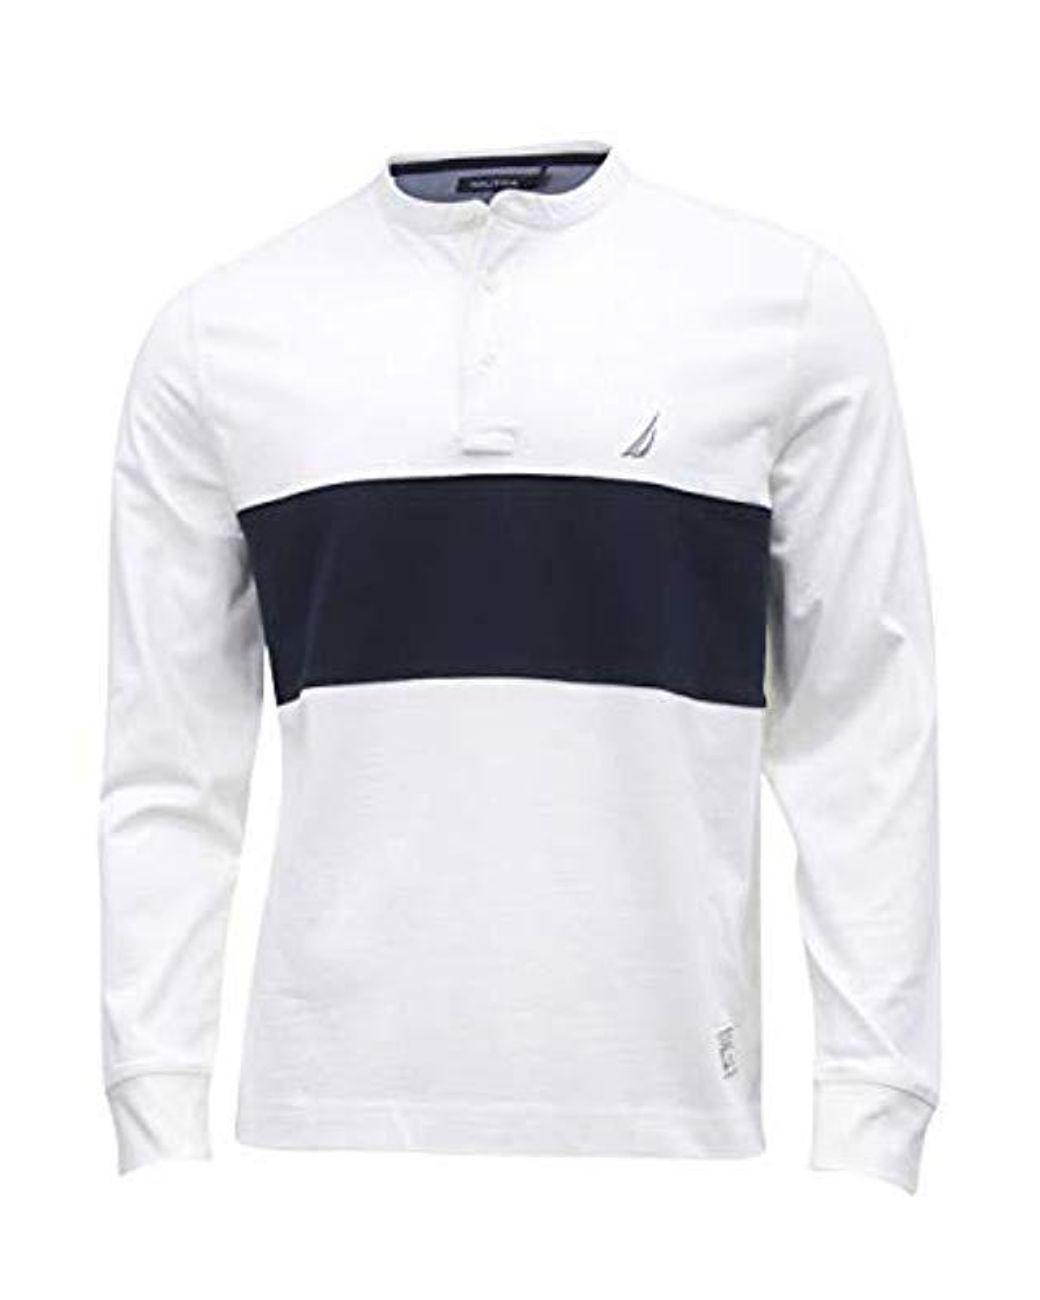 Perry Ellis Mens Shirt Medium Long Sleeve Henly Nightshirt